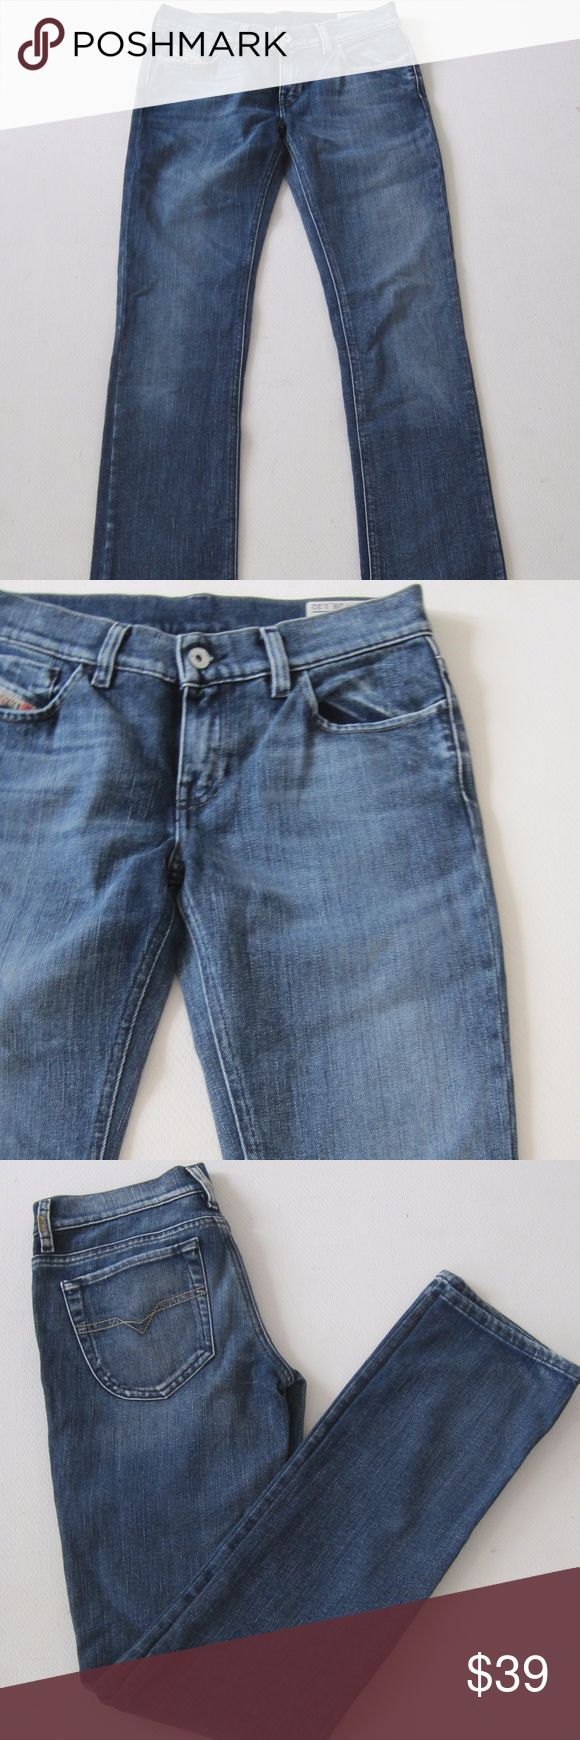 Diesel Liv Industry Jeans Bootcut Dark Wash Casual Diesel Liv Industry Womens Jeans Size 28/32 Bootcut Dark Wash Casual   gently worn A5711kt10 Diesel Jeans Boot Cut